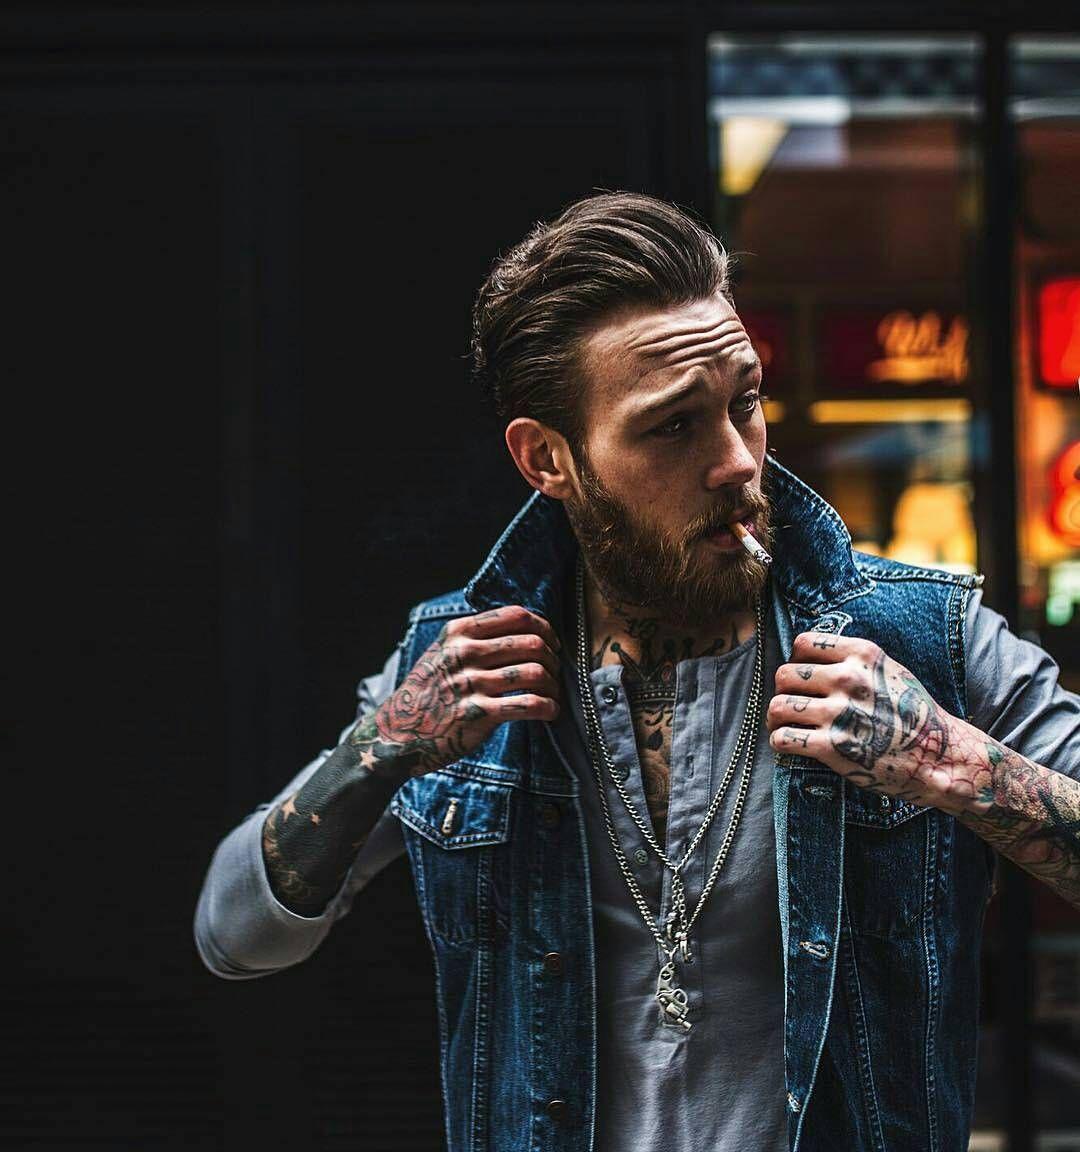 Billy Huxley - beard mustache bearded man men mens' style fashion clothing denim tattoos tattooed barber hair #beardsforever